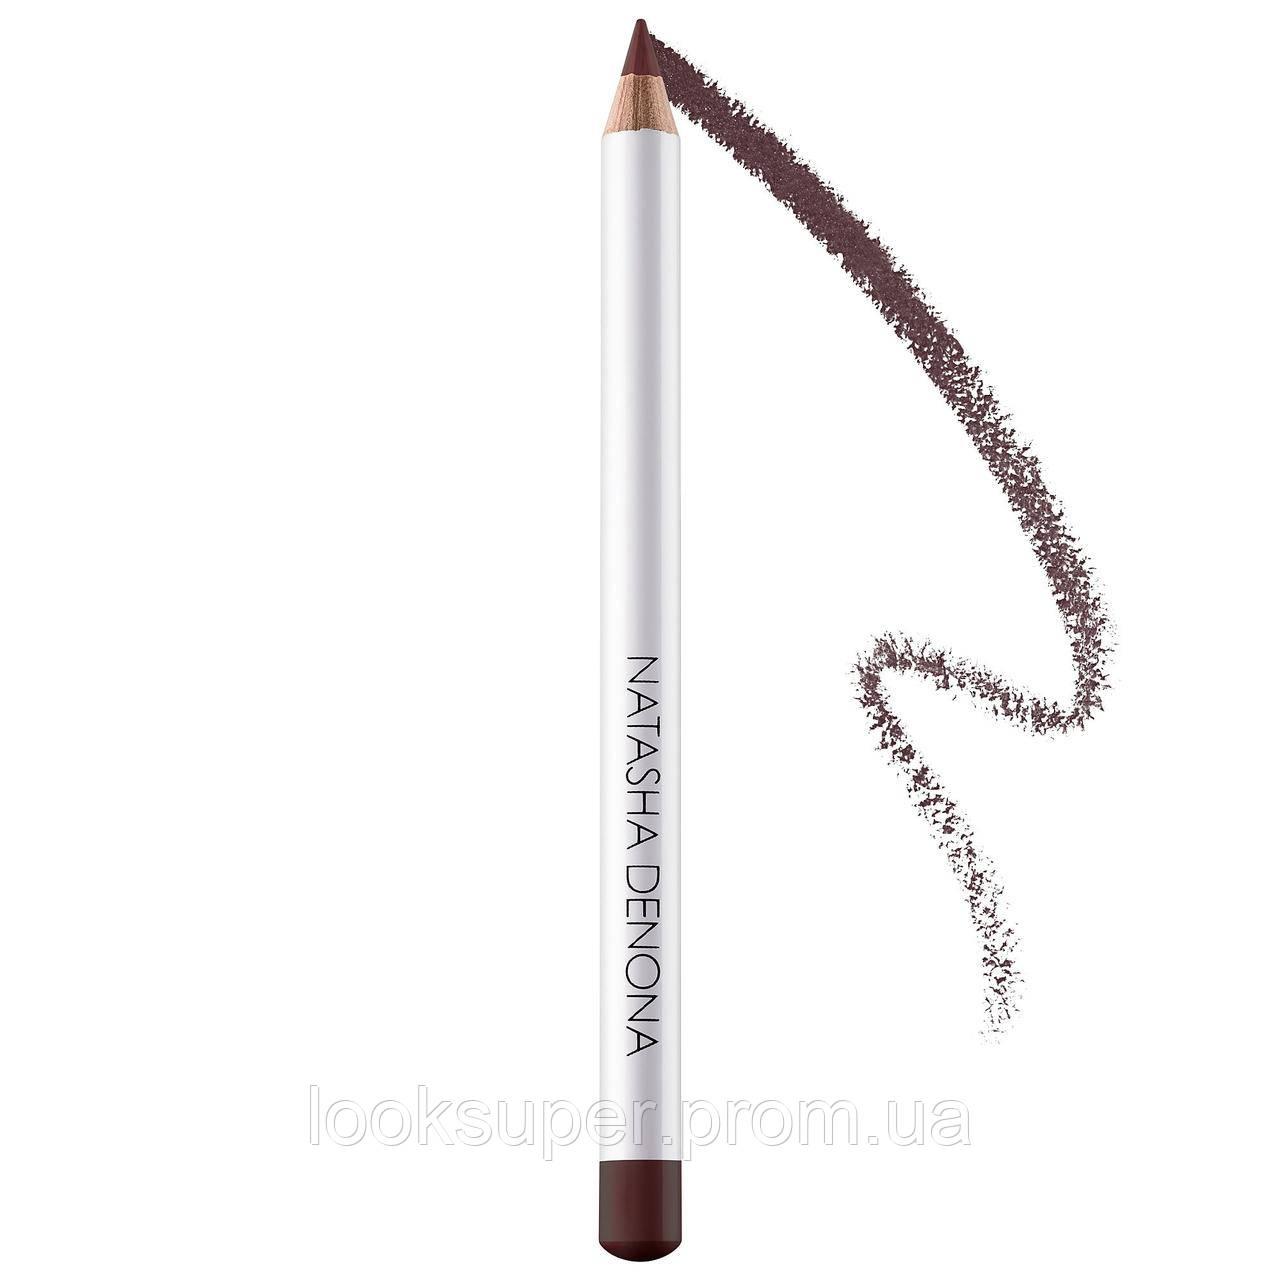 Карандаш для подводки глаз NATASHA DENONA  Eye Liner Pencil  brown